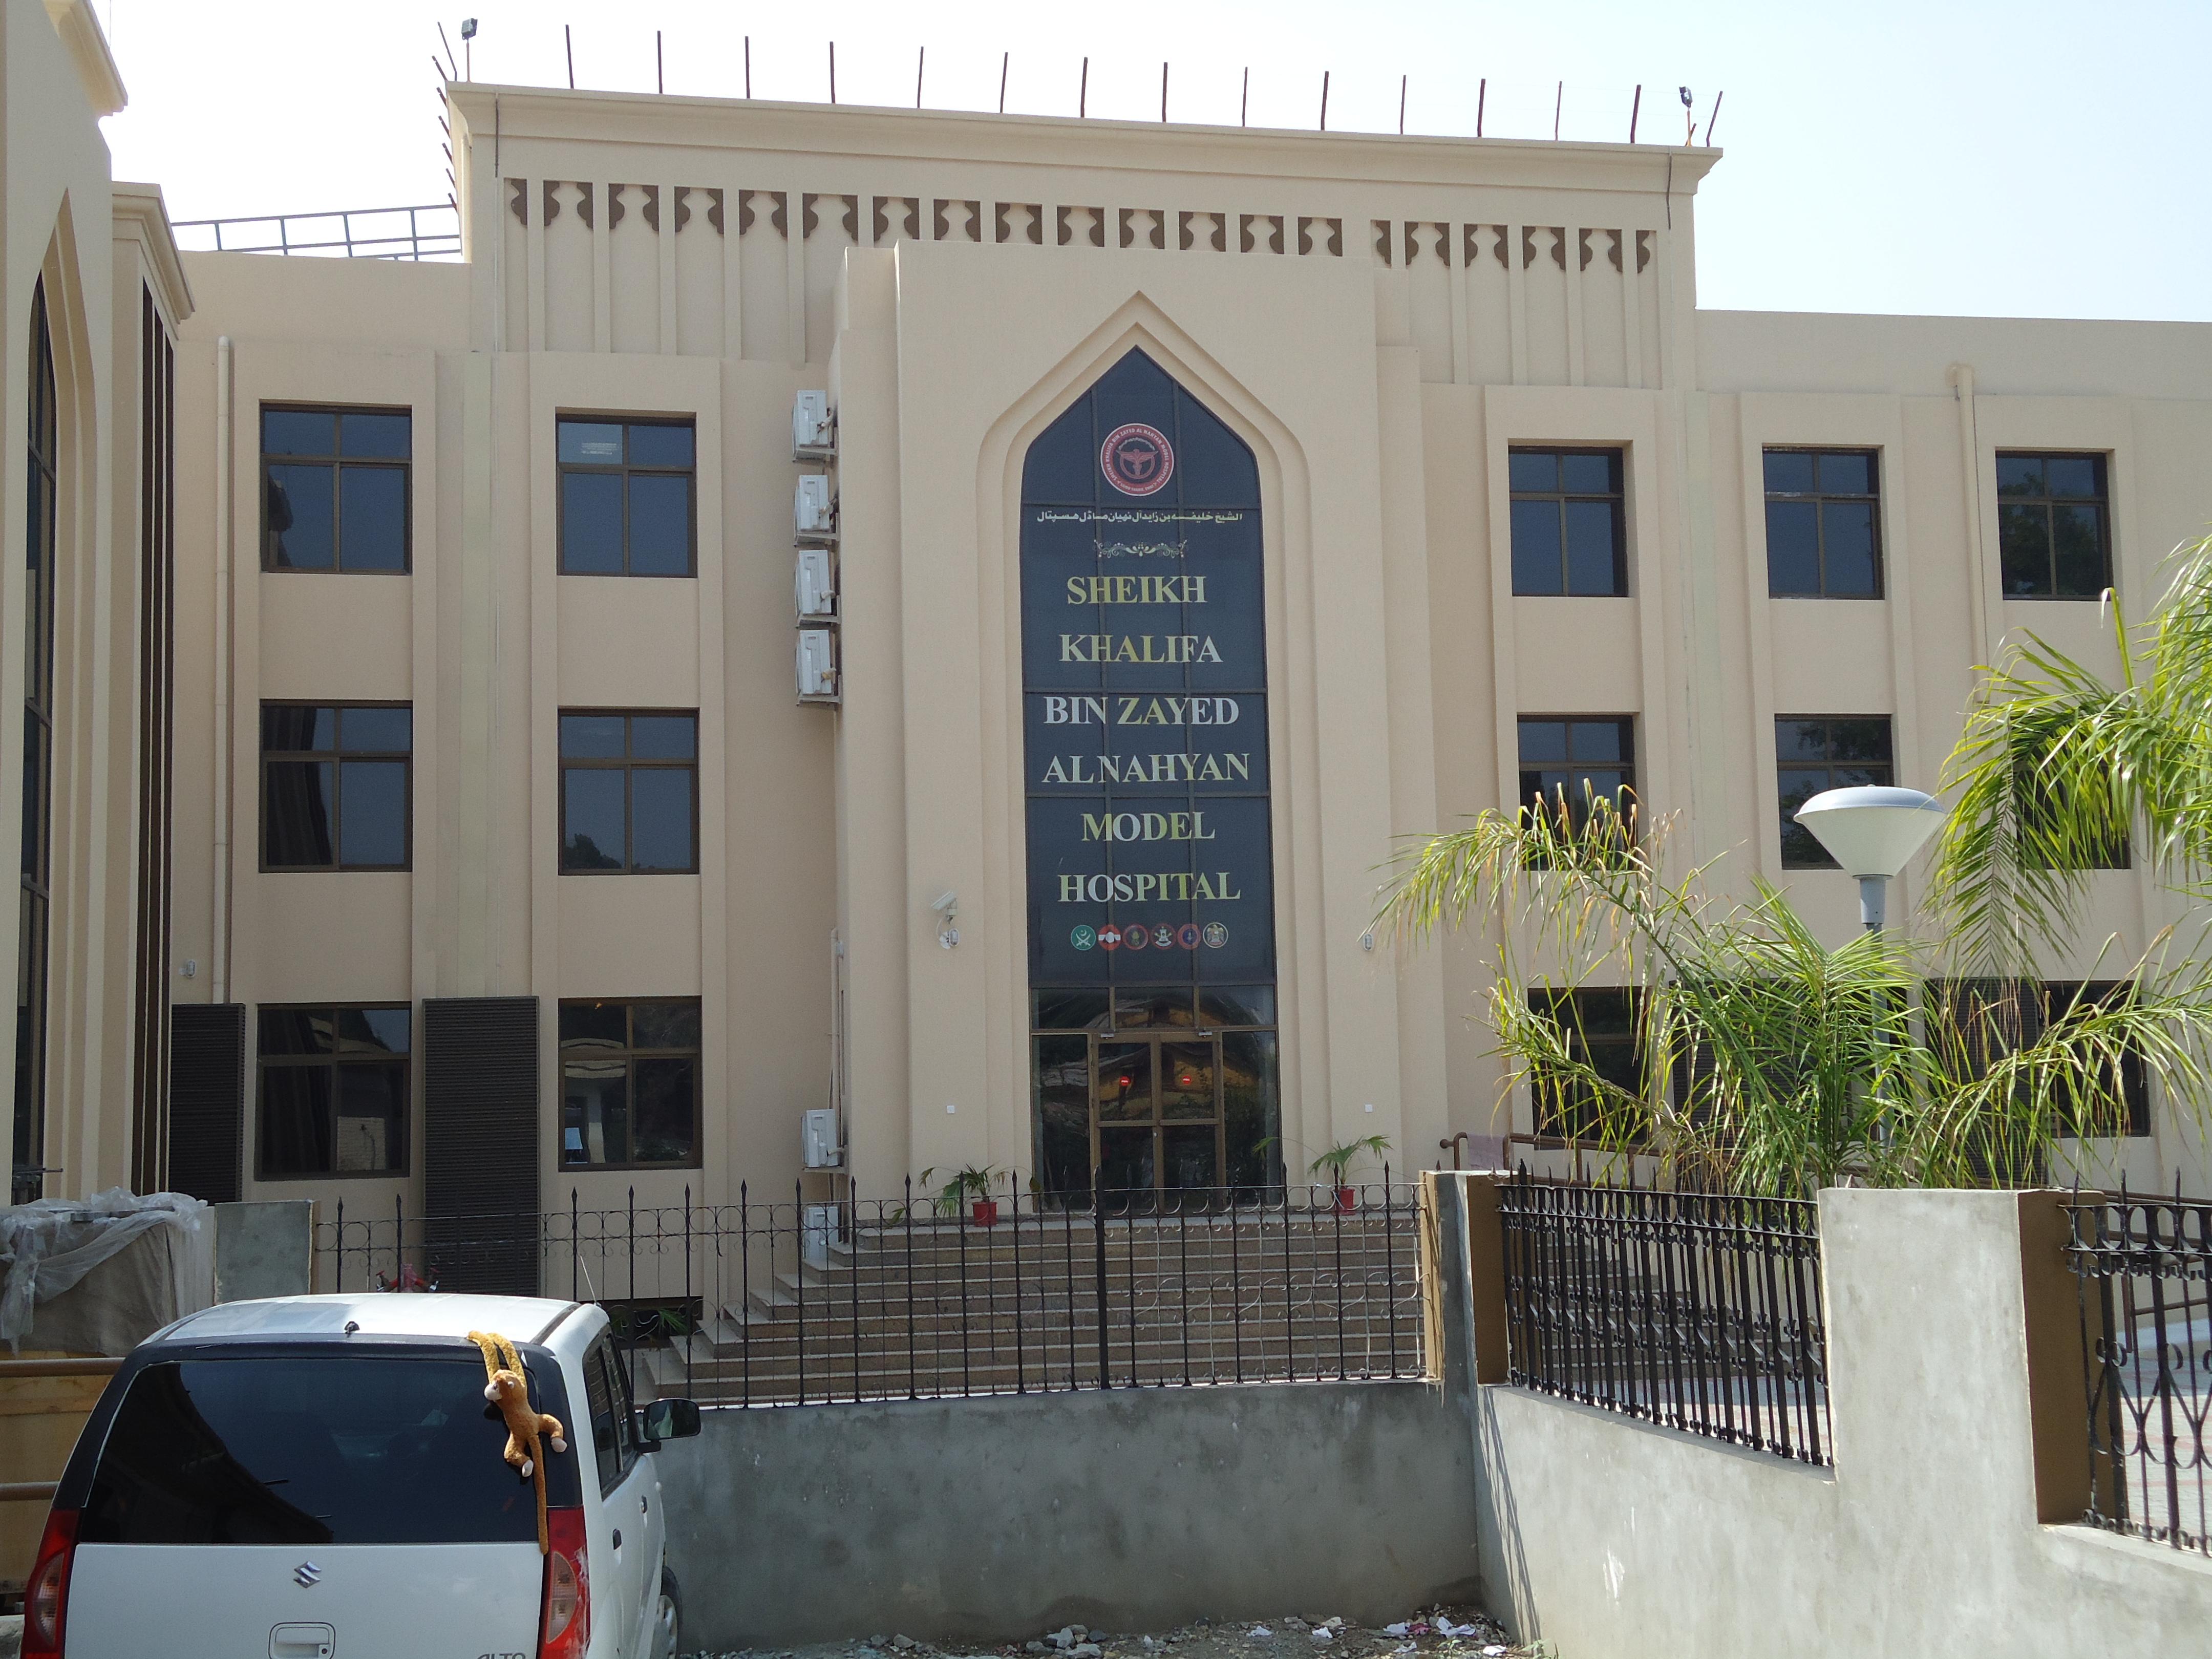 شیخ خلیفہ بن زید النہیان ہسپتال